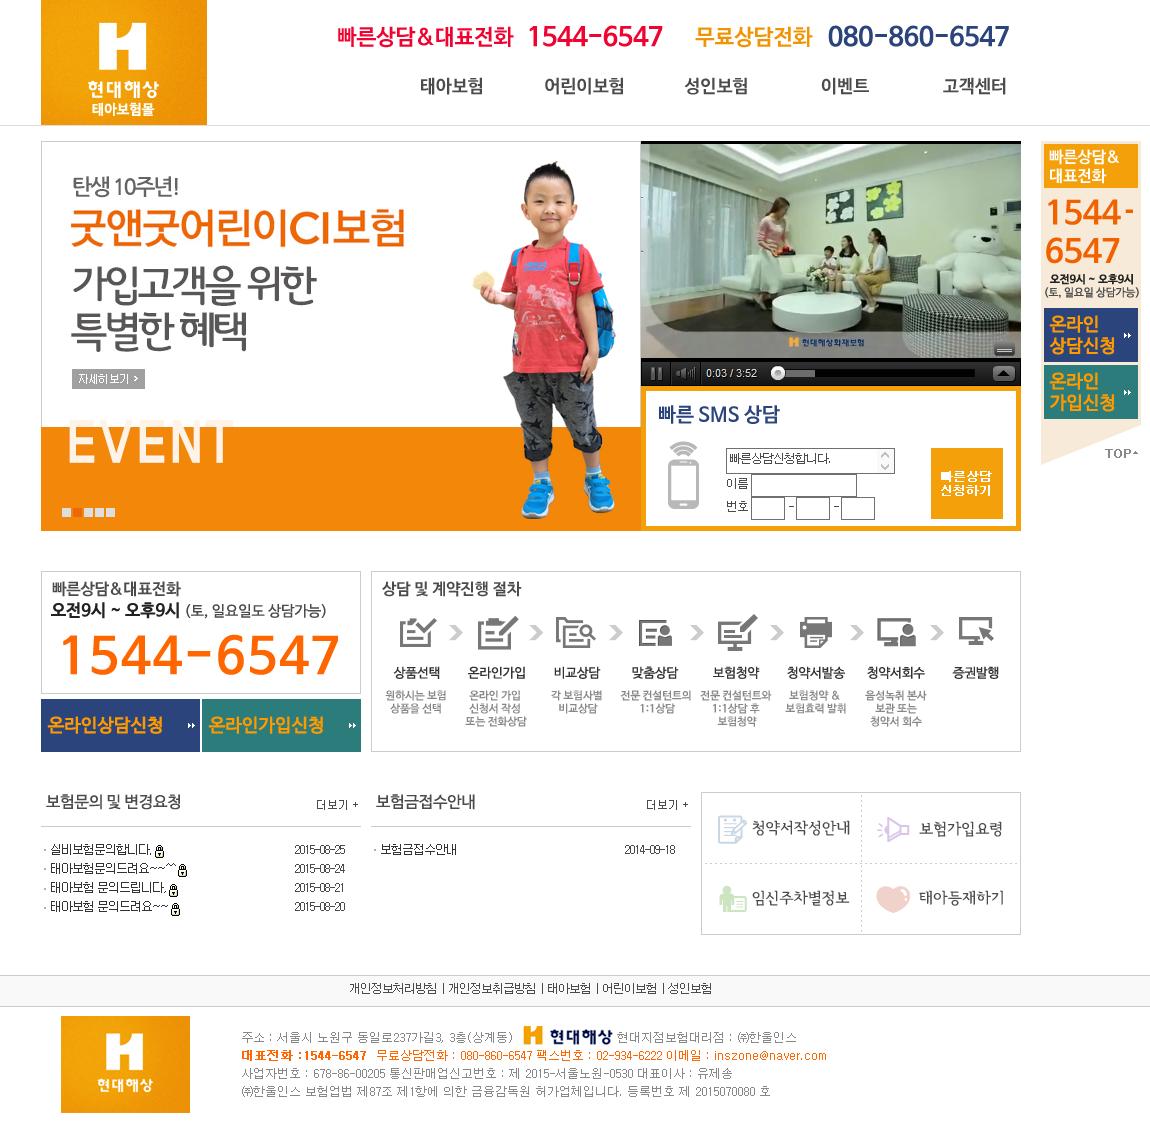 hi-hyundai-imall_com.png